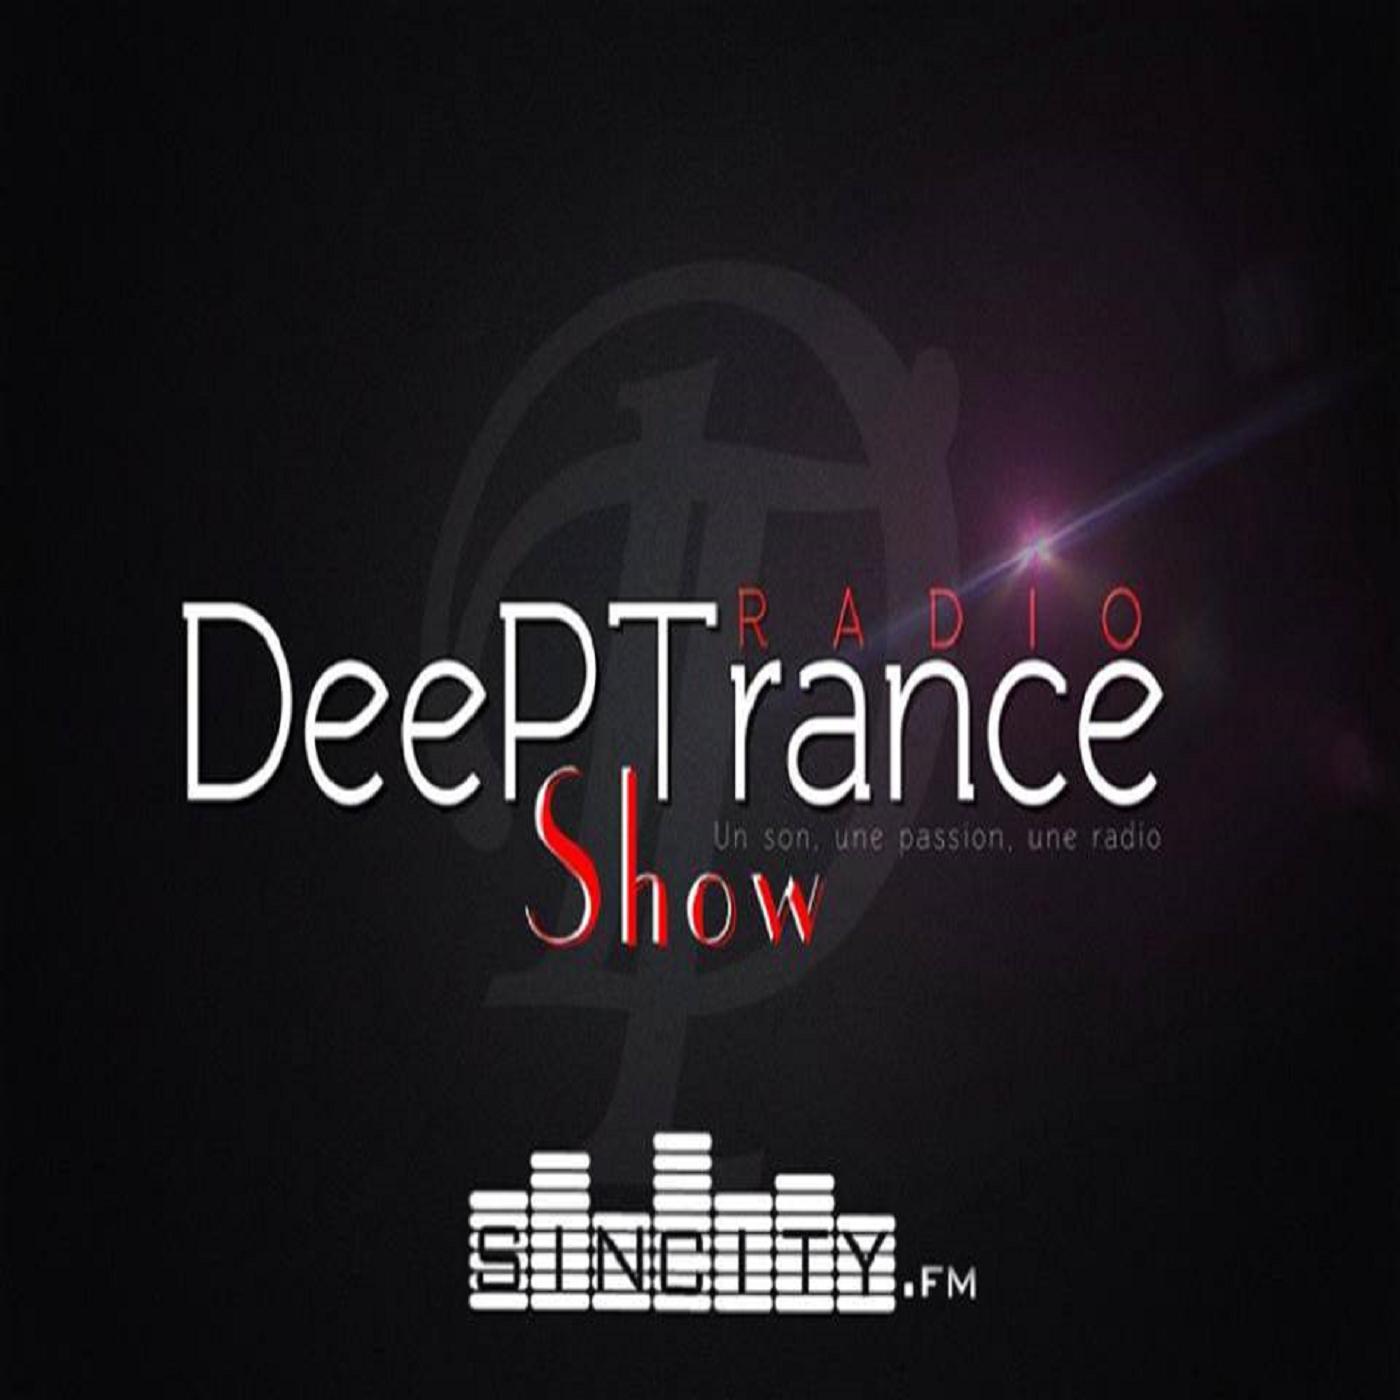 DJ DeepTrance